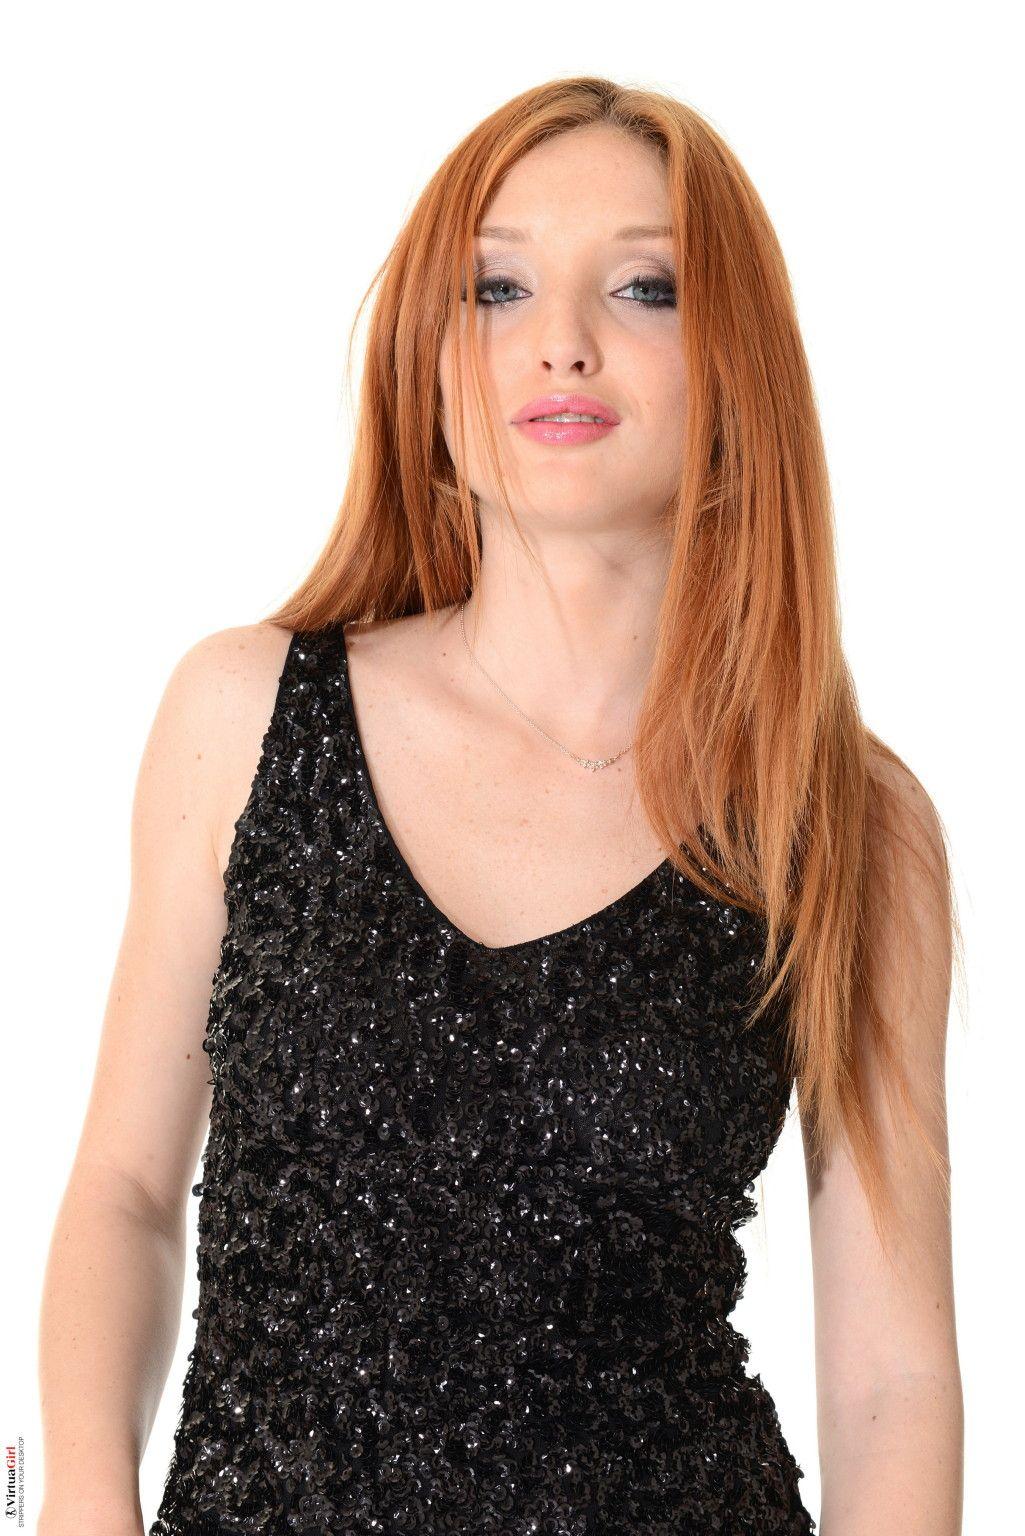 Angel Blond Porn Gallerys sweaty ukrainian redhead angel erotic dance and stretching